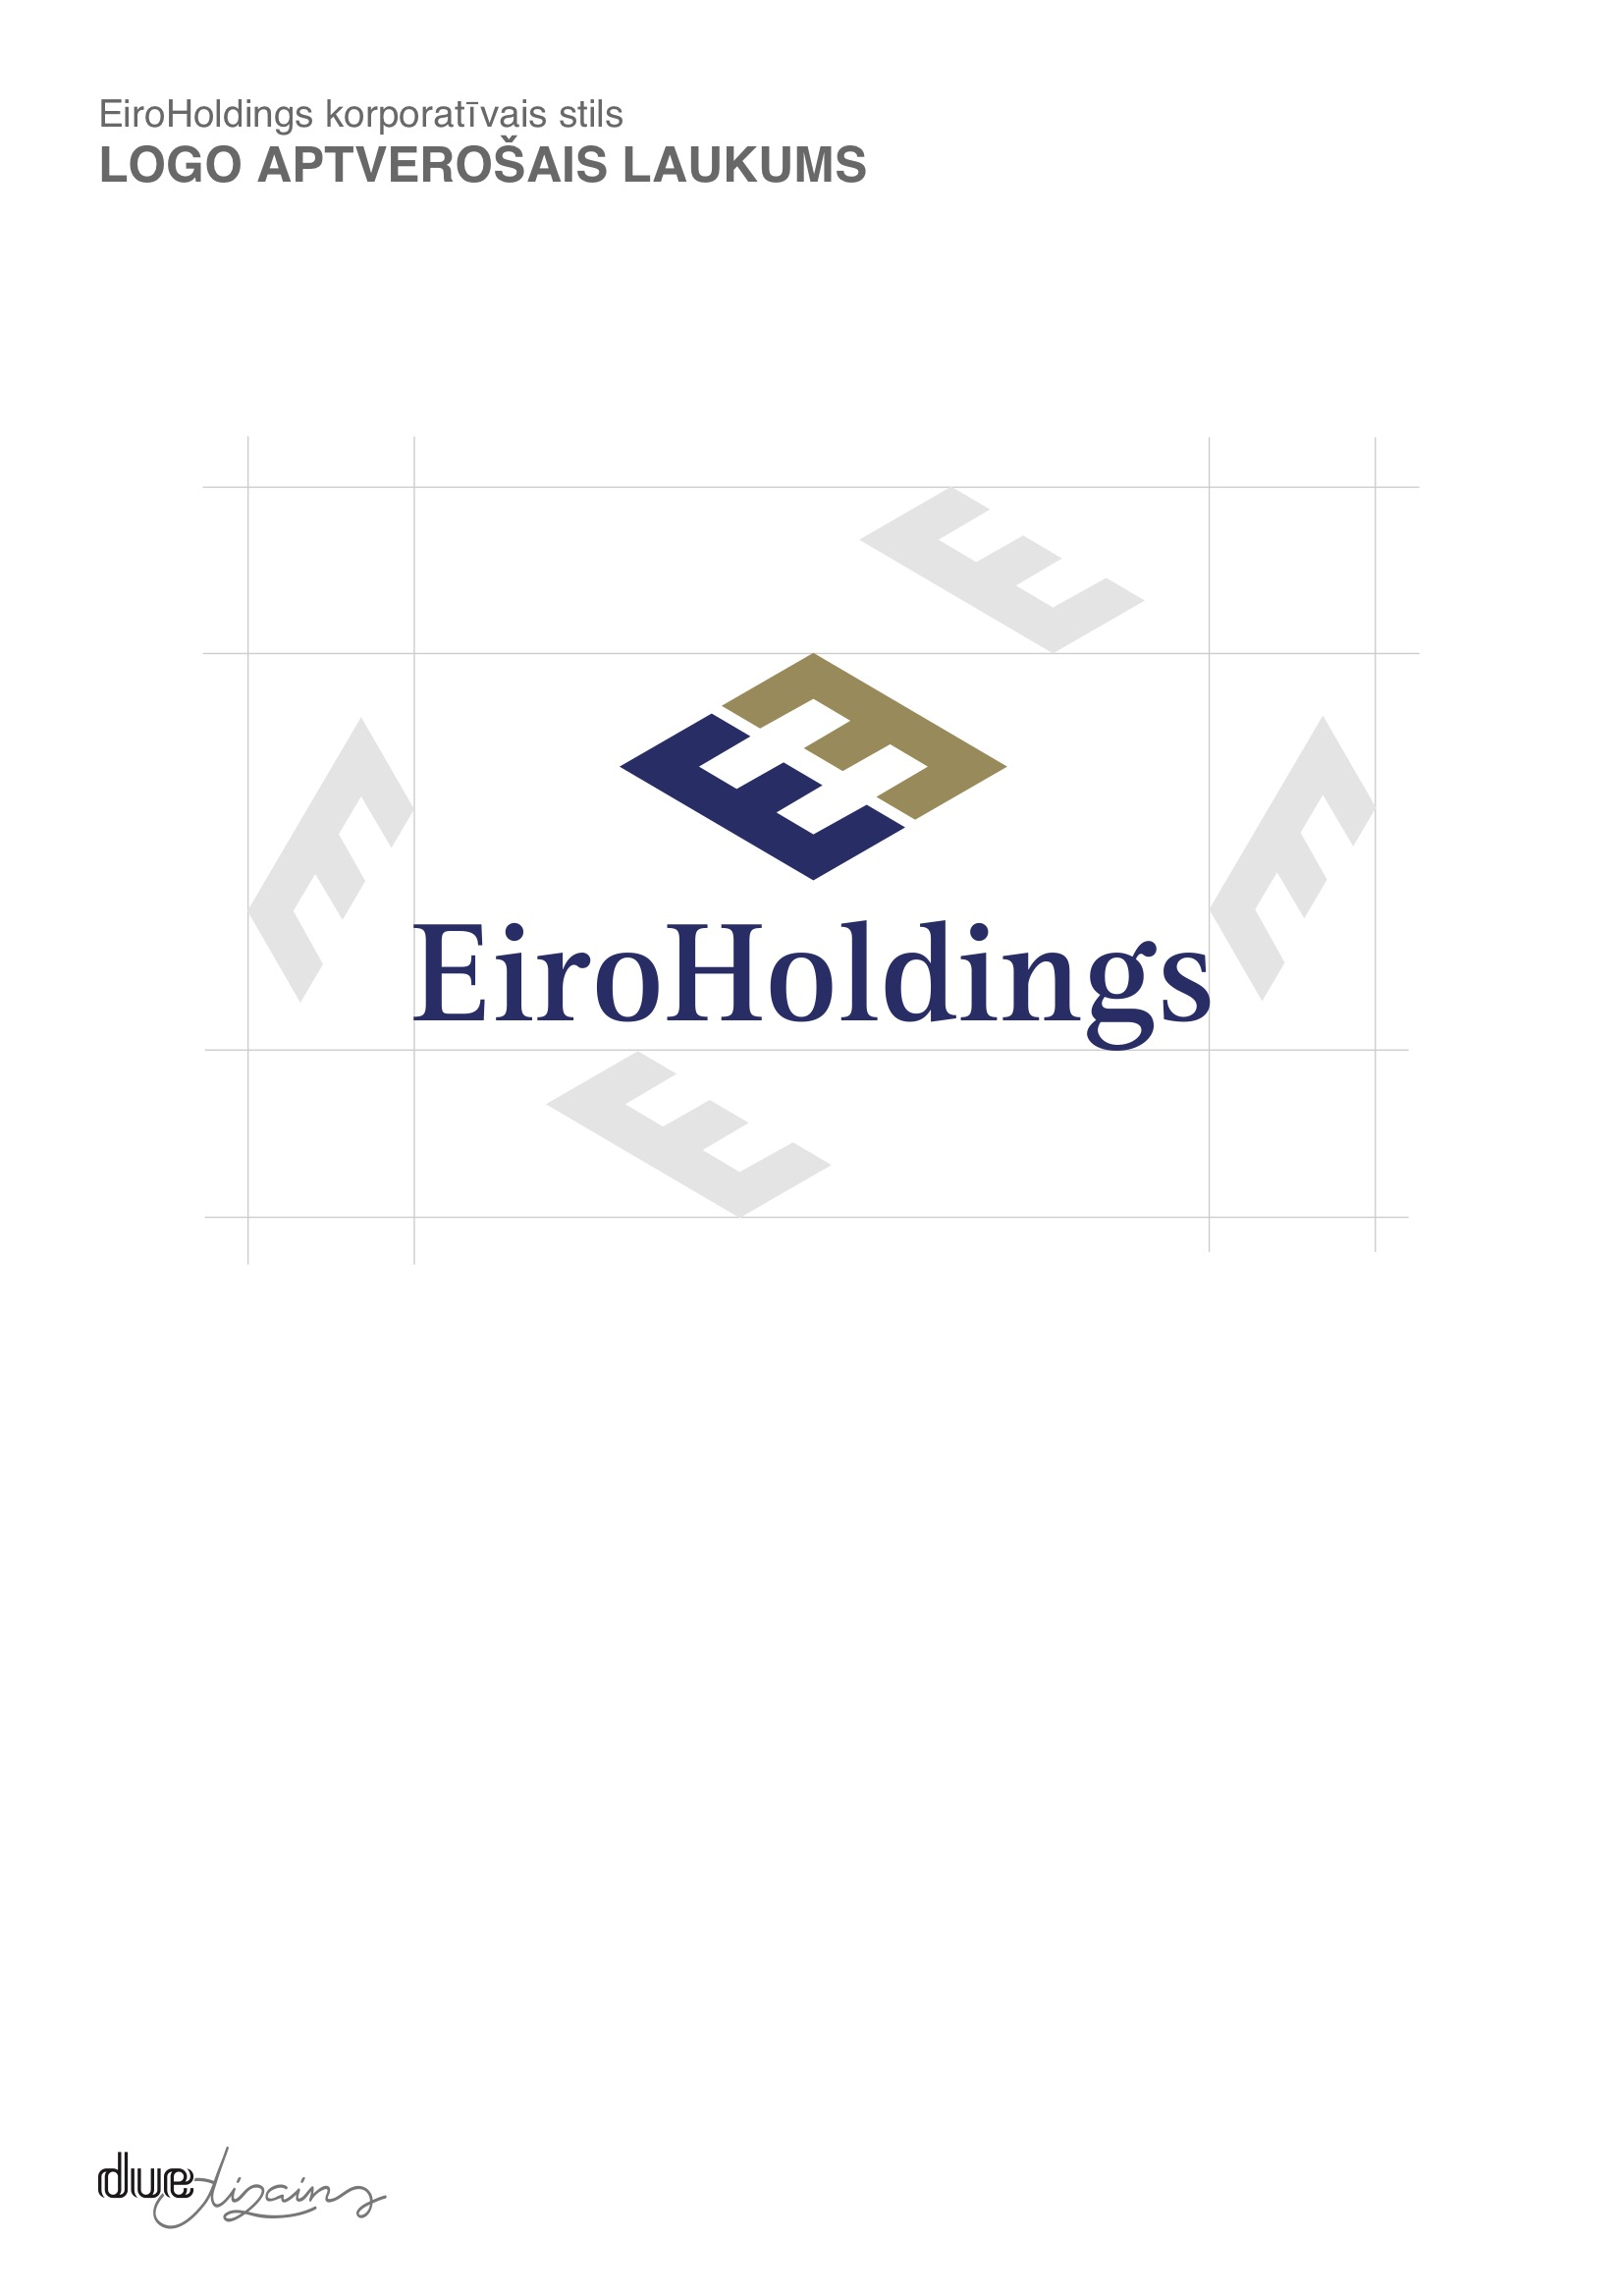 Eiroholdings_logo_guidelines 7